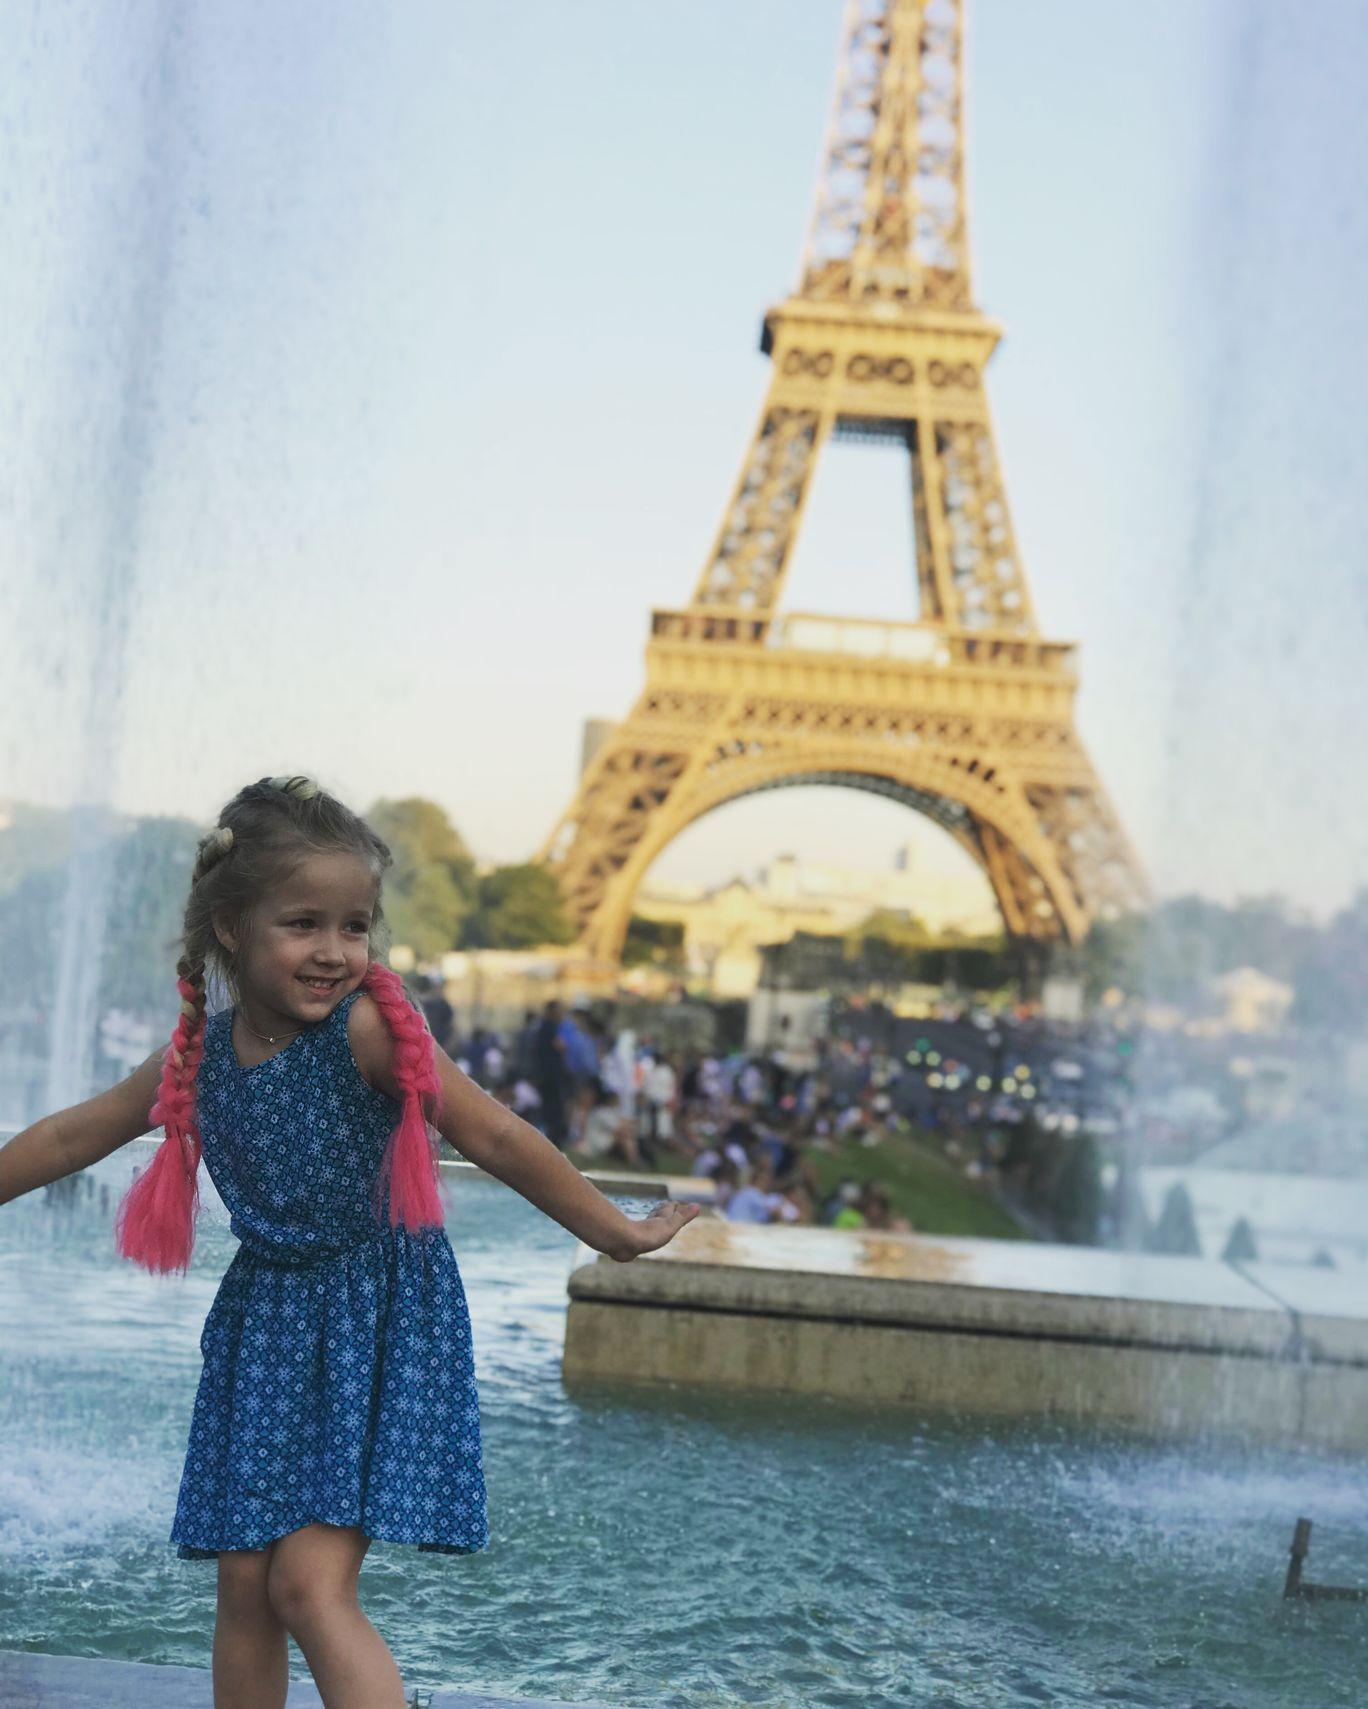 Photo of Eiffel Tower By Neha Malik